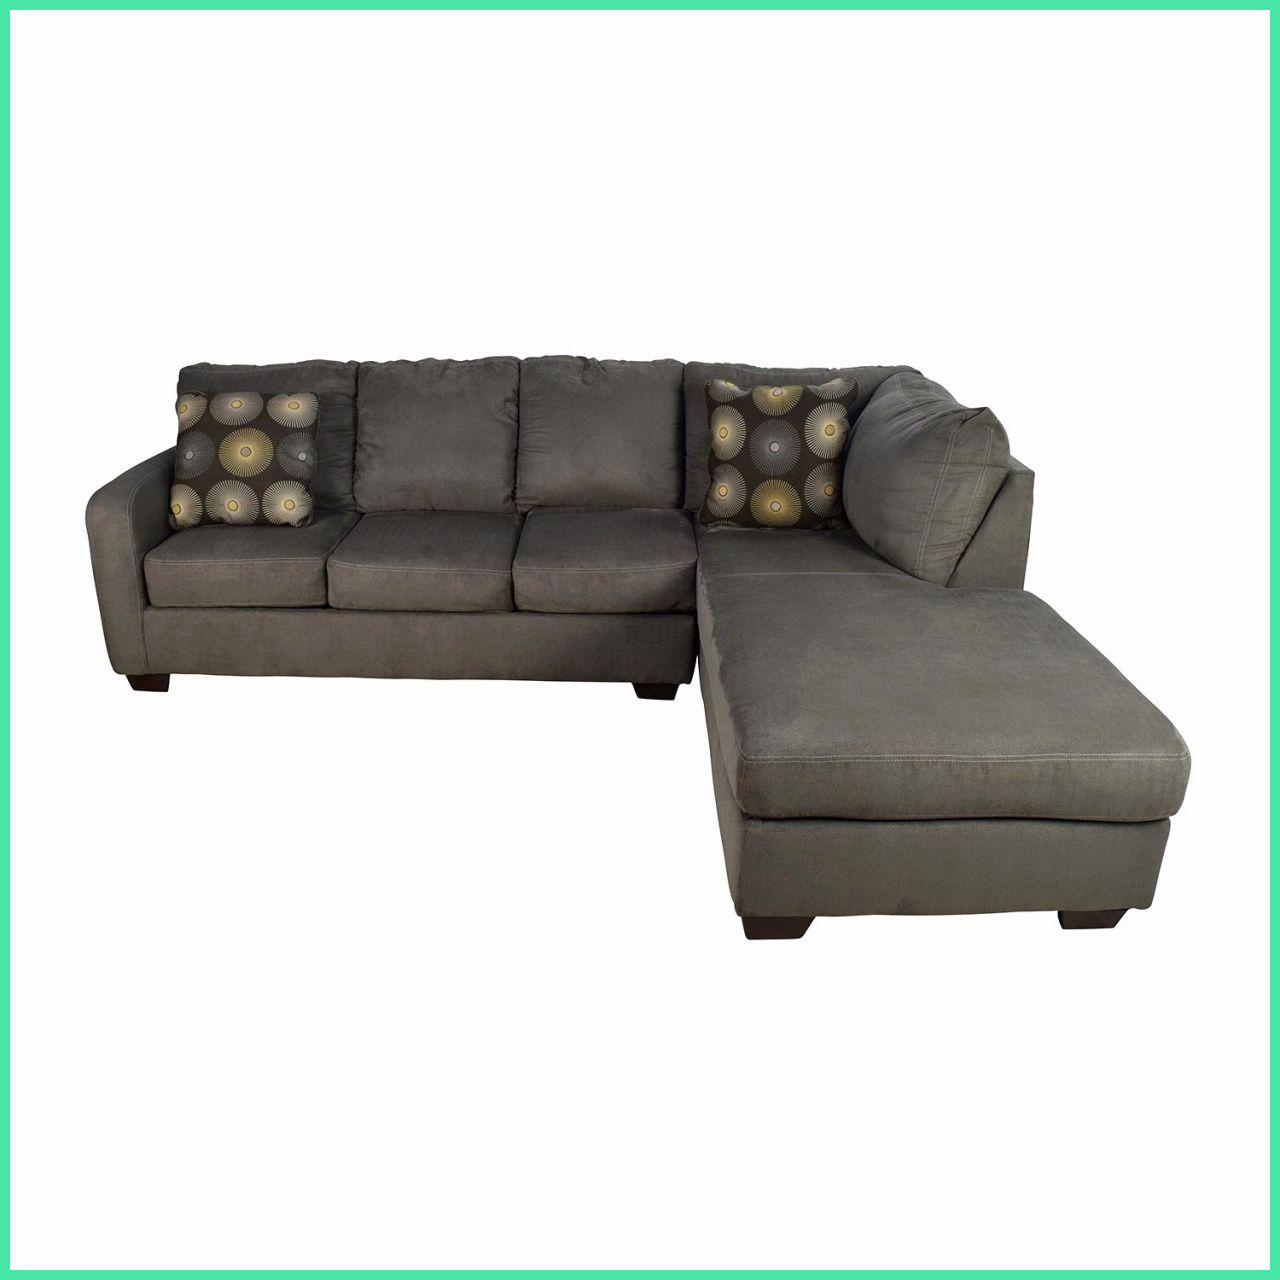 20 Kollektion Ikea Ledersofa Braun Ikea Sofa Sofa Sectional Couch